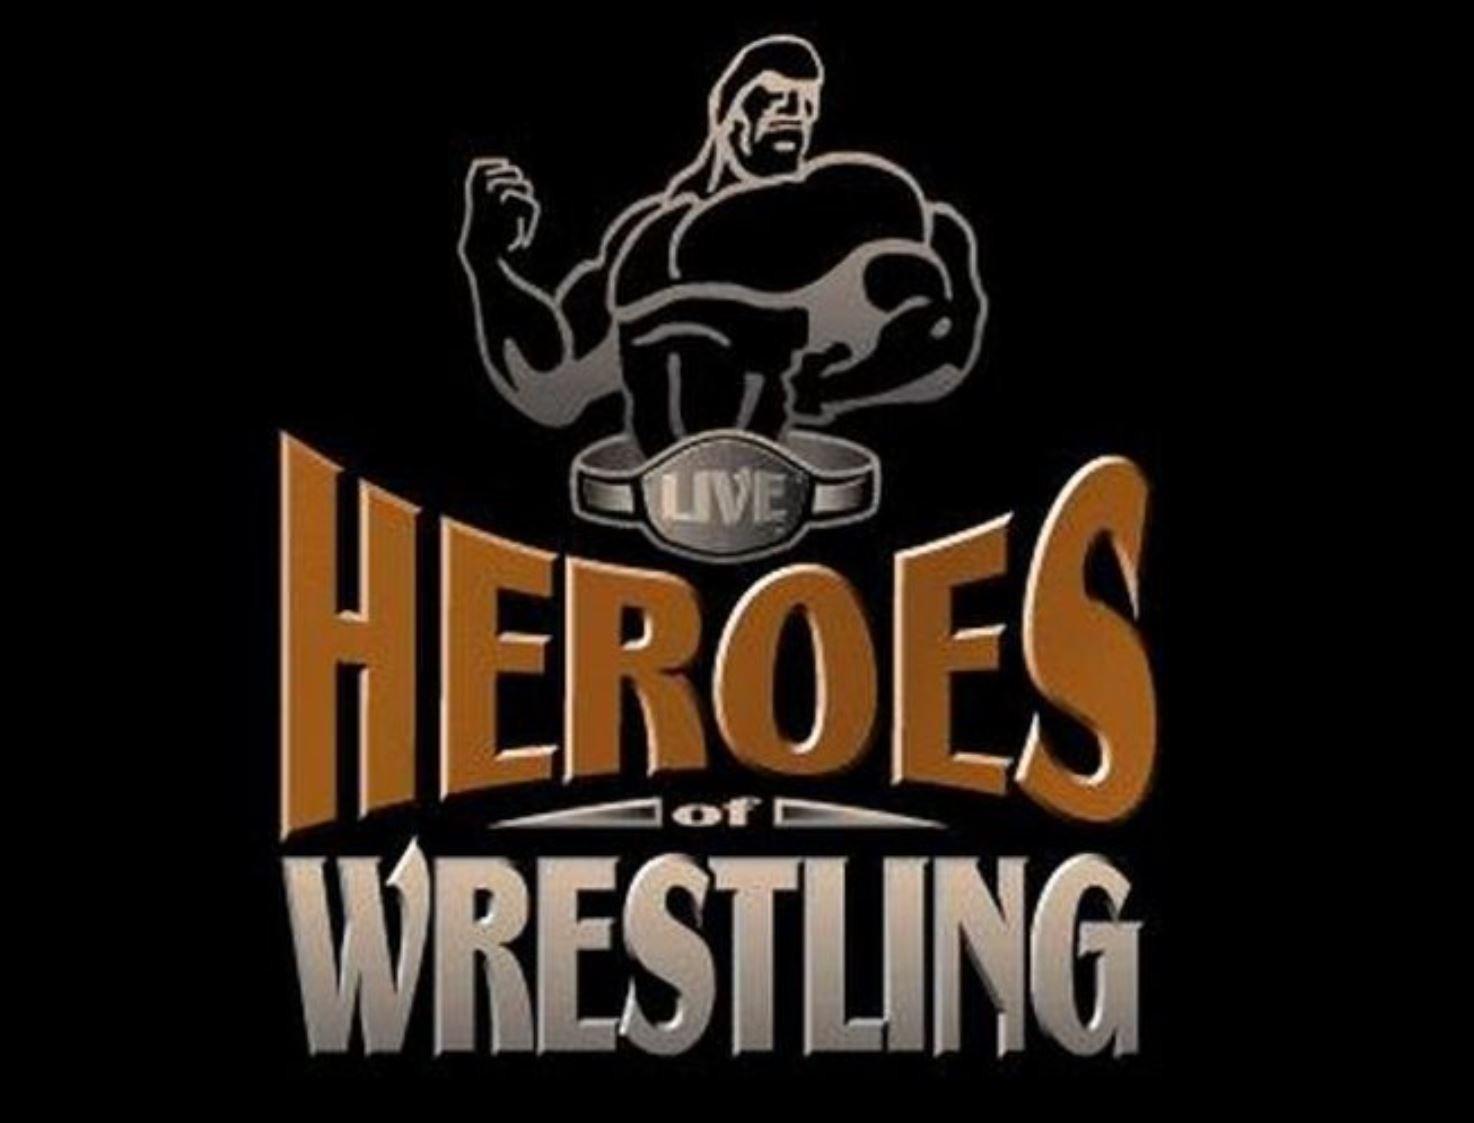 Heroes of Wrestling logo